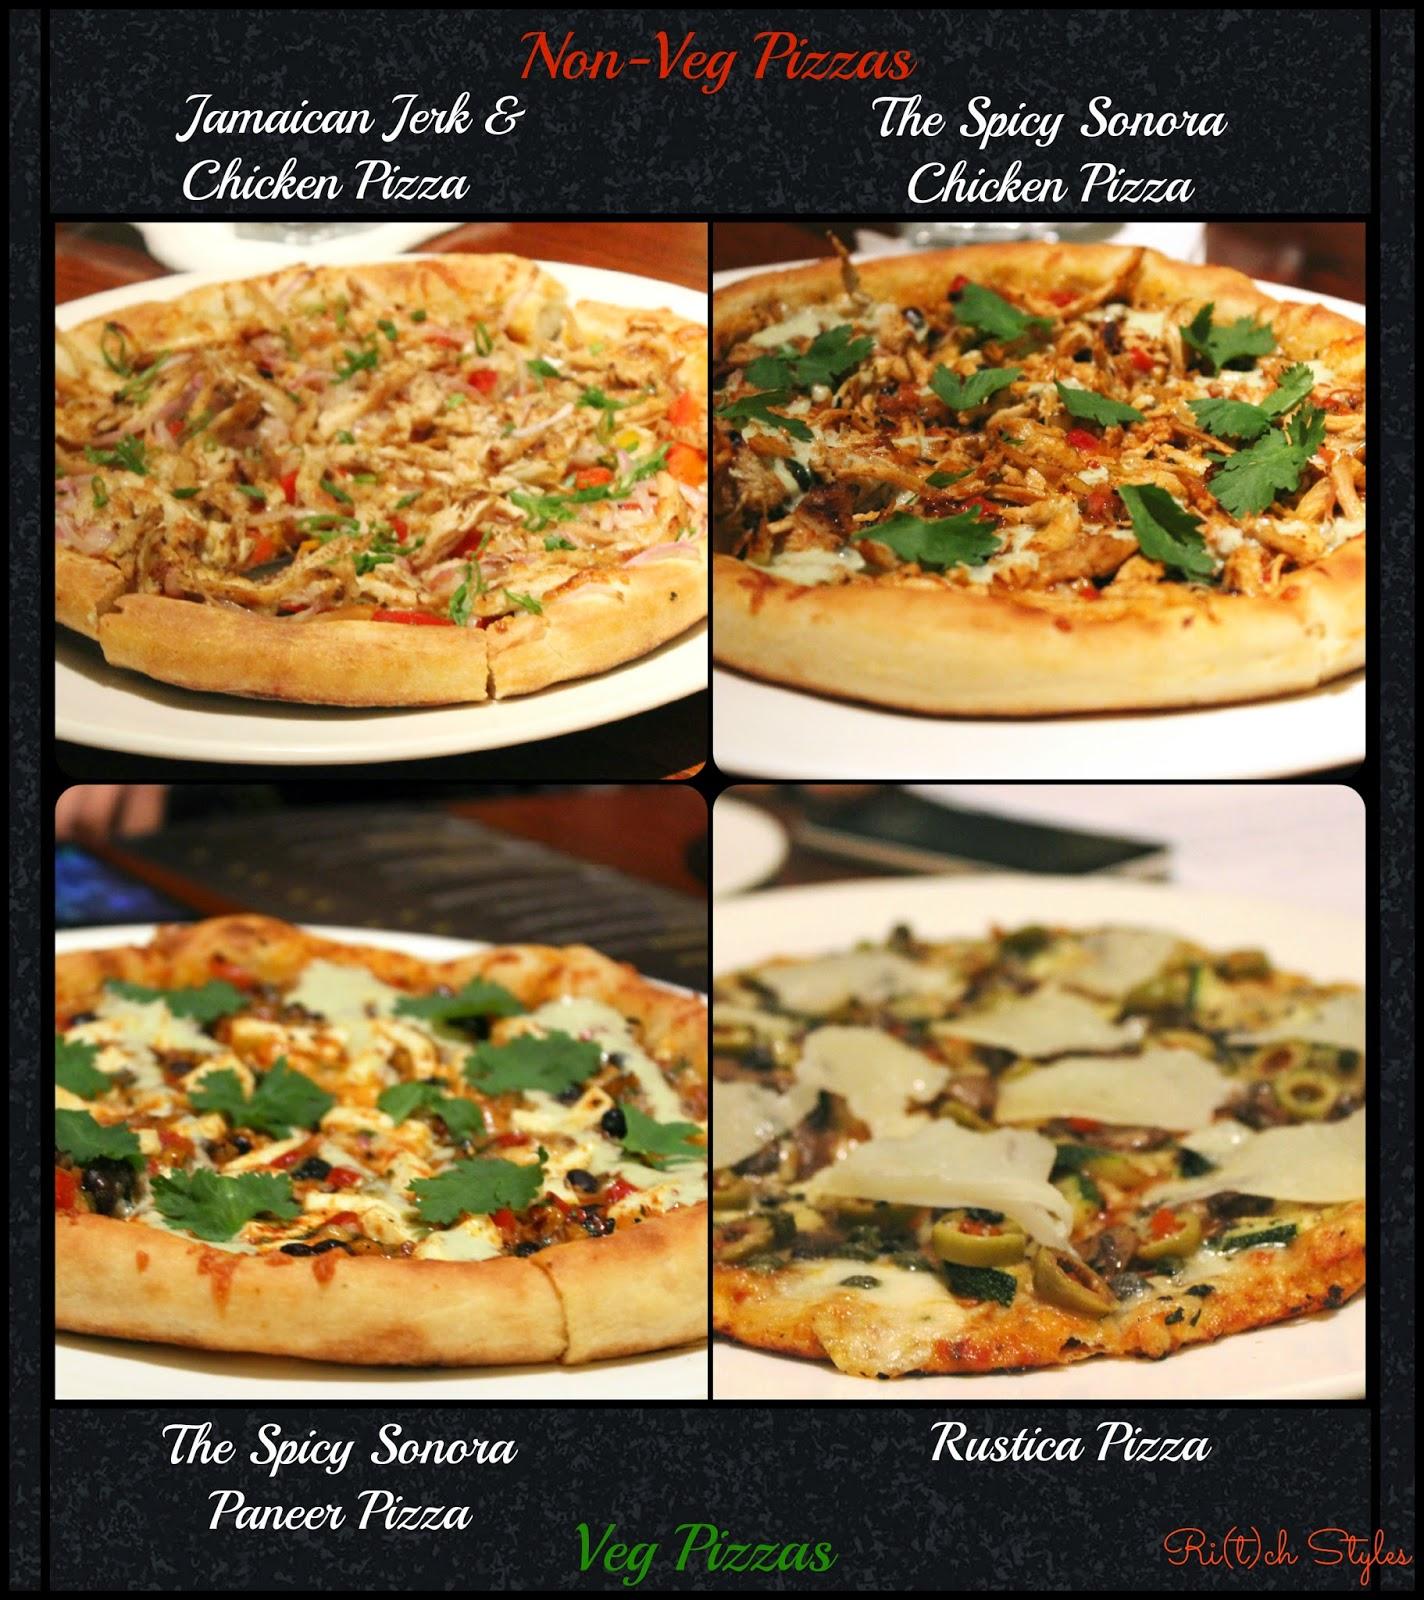 California Pizza Kitchen Menu: Ri(t)ch Styles : Indian Fashion, Beauty, Lifestyle And